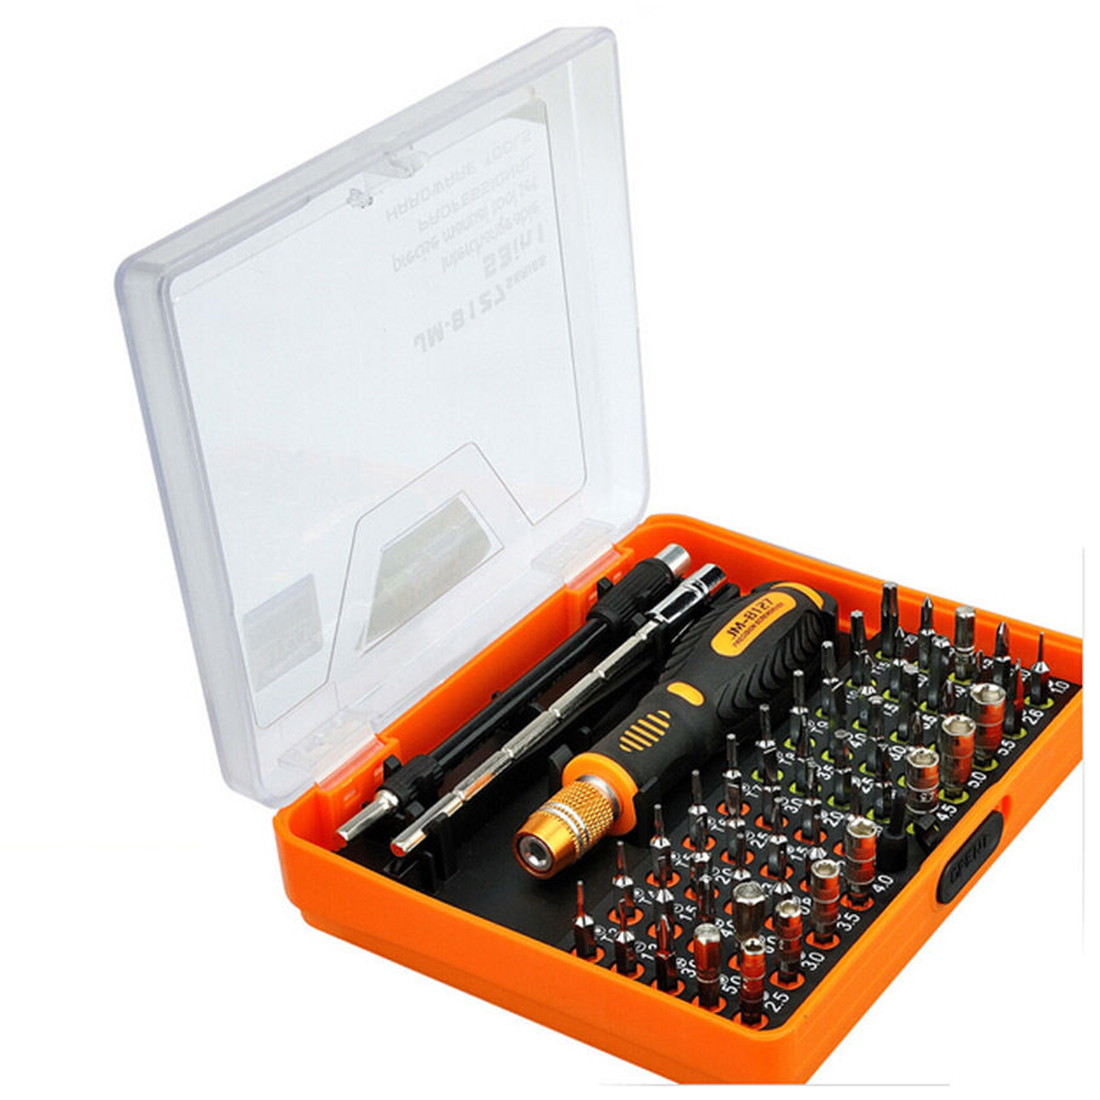 Jakemy JM-8127 Magnetic 54in1 Screwdriver Set Electronic Disassemble Repair Tool  jakemy jm 6092b 58 in 1 screwdriver set